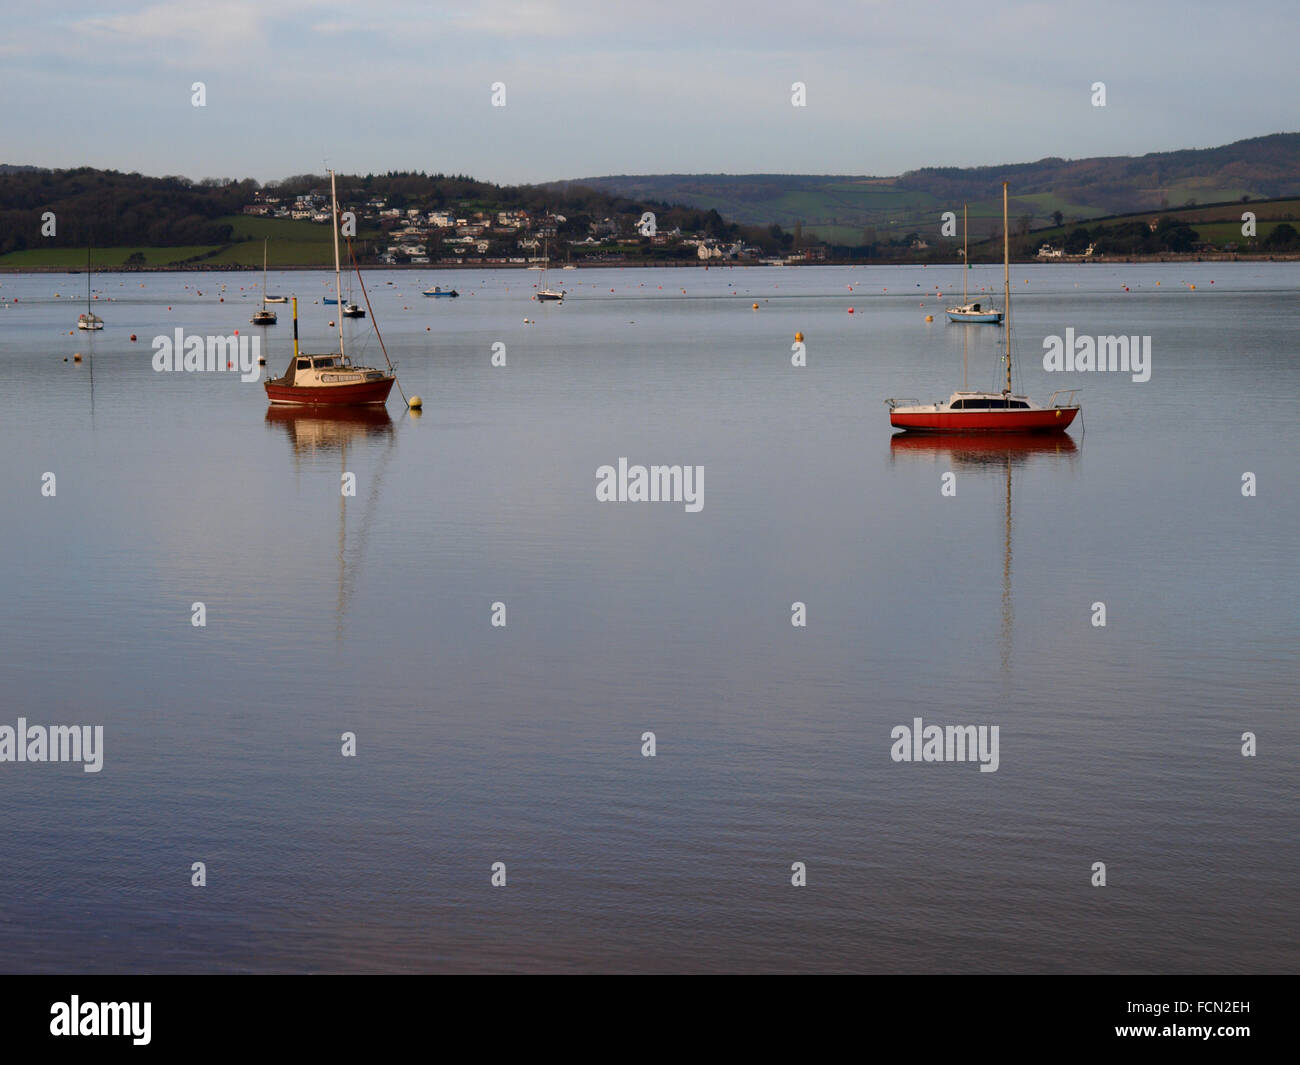 Exe Estuary from Exmouth, Devon, UK - Stock Image